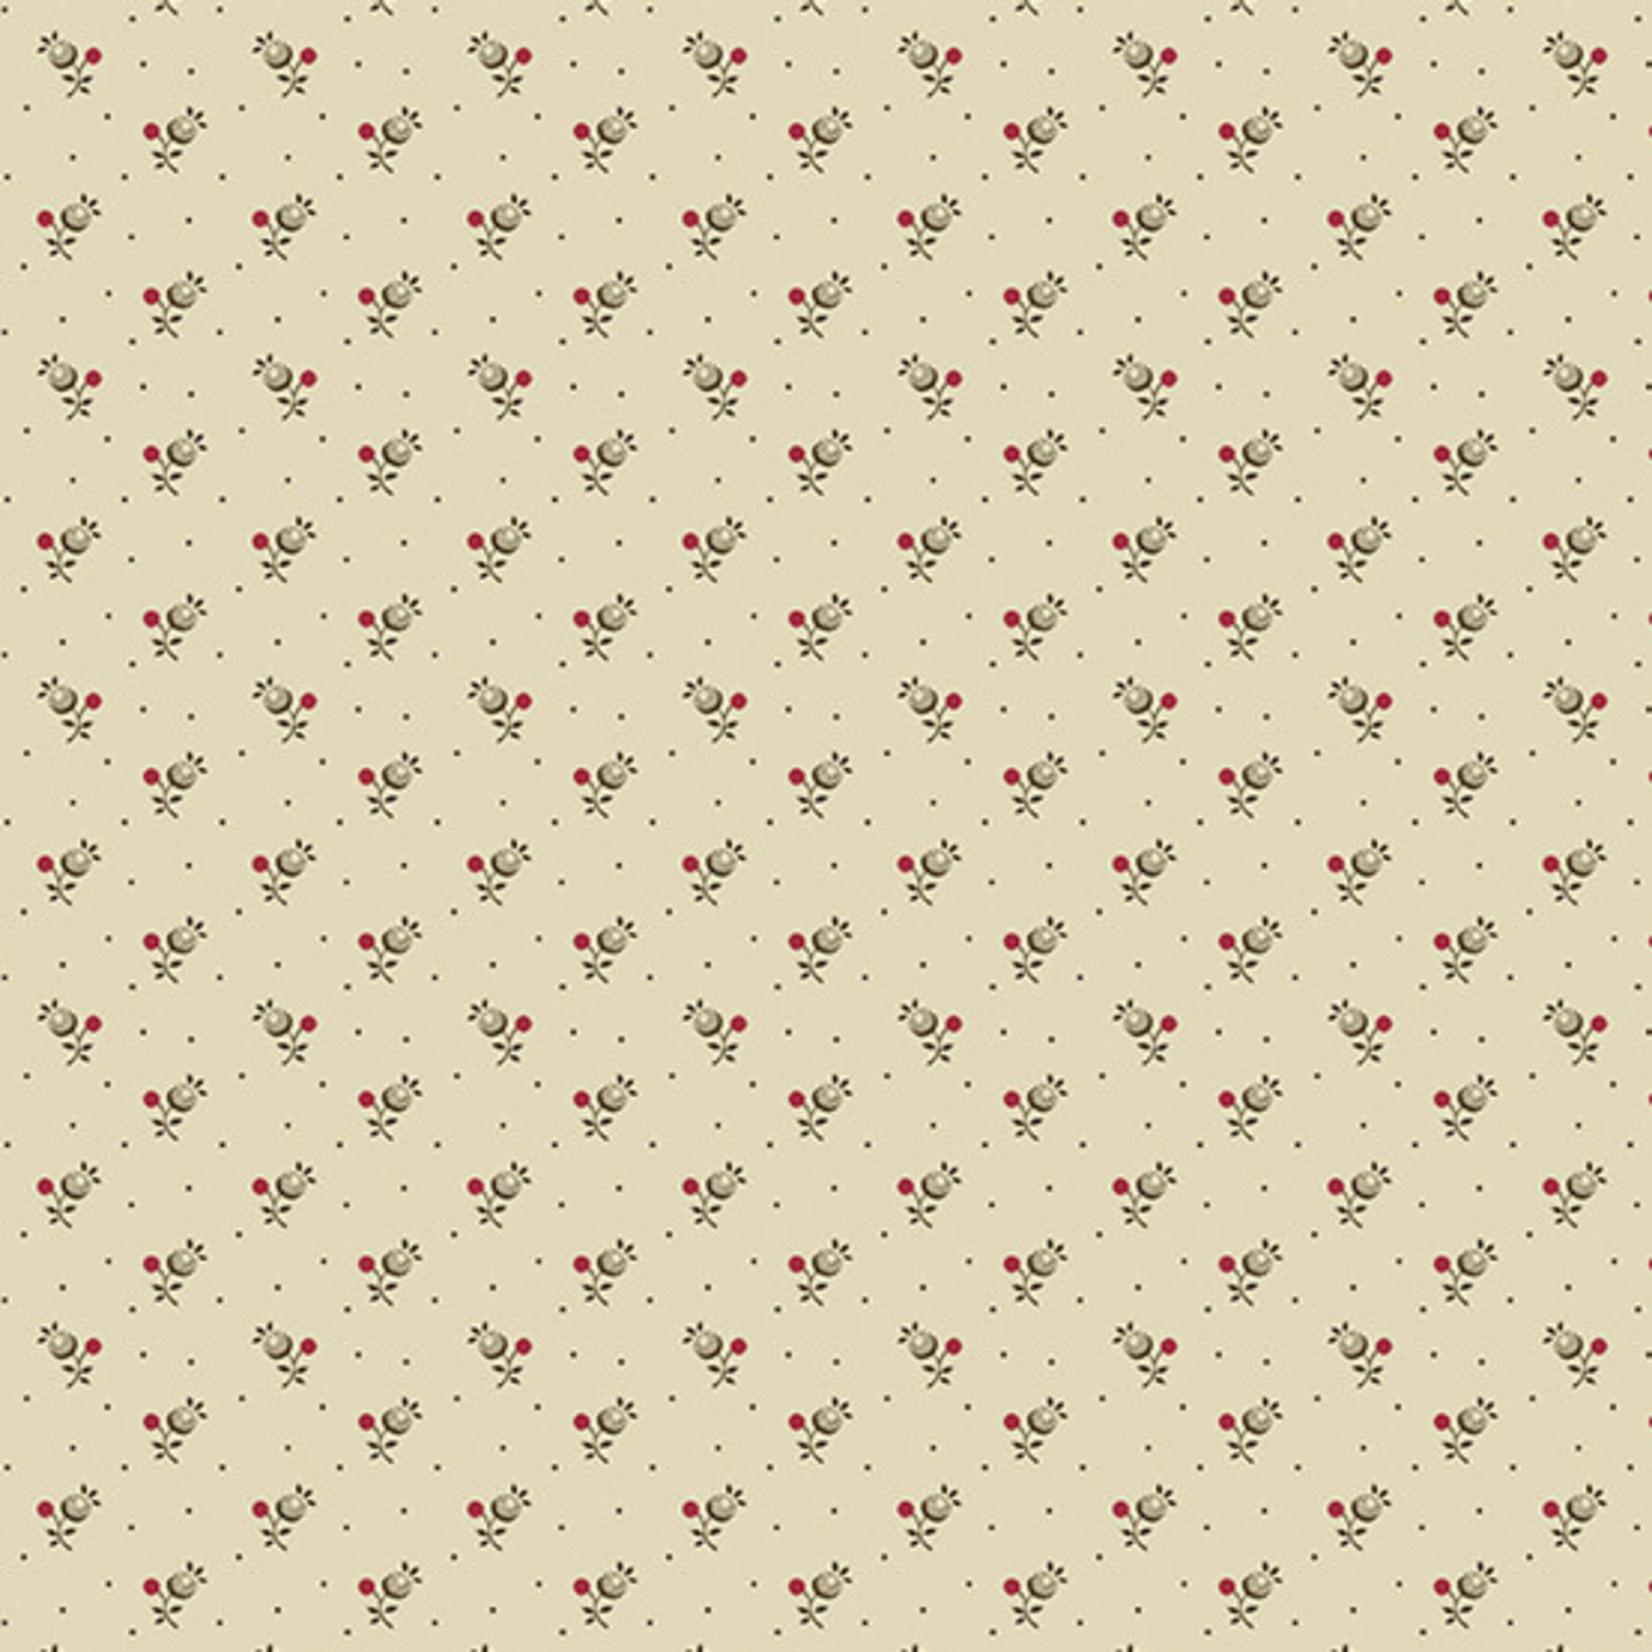 Edyta Sitar Secret Stash - Neutrals, Forget-Me-Not, Tan (9460-N) $0.20 per cm or $20/m